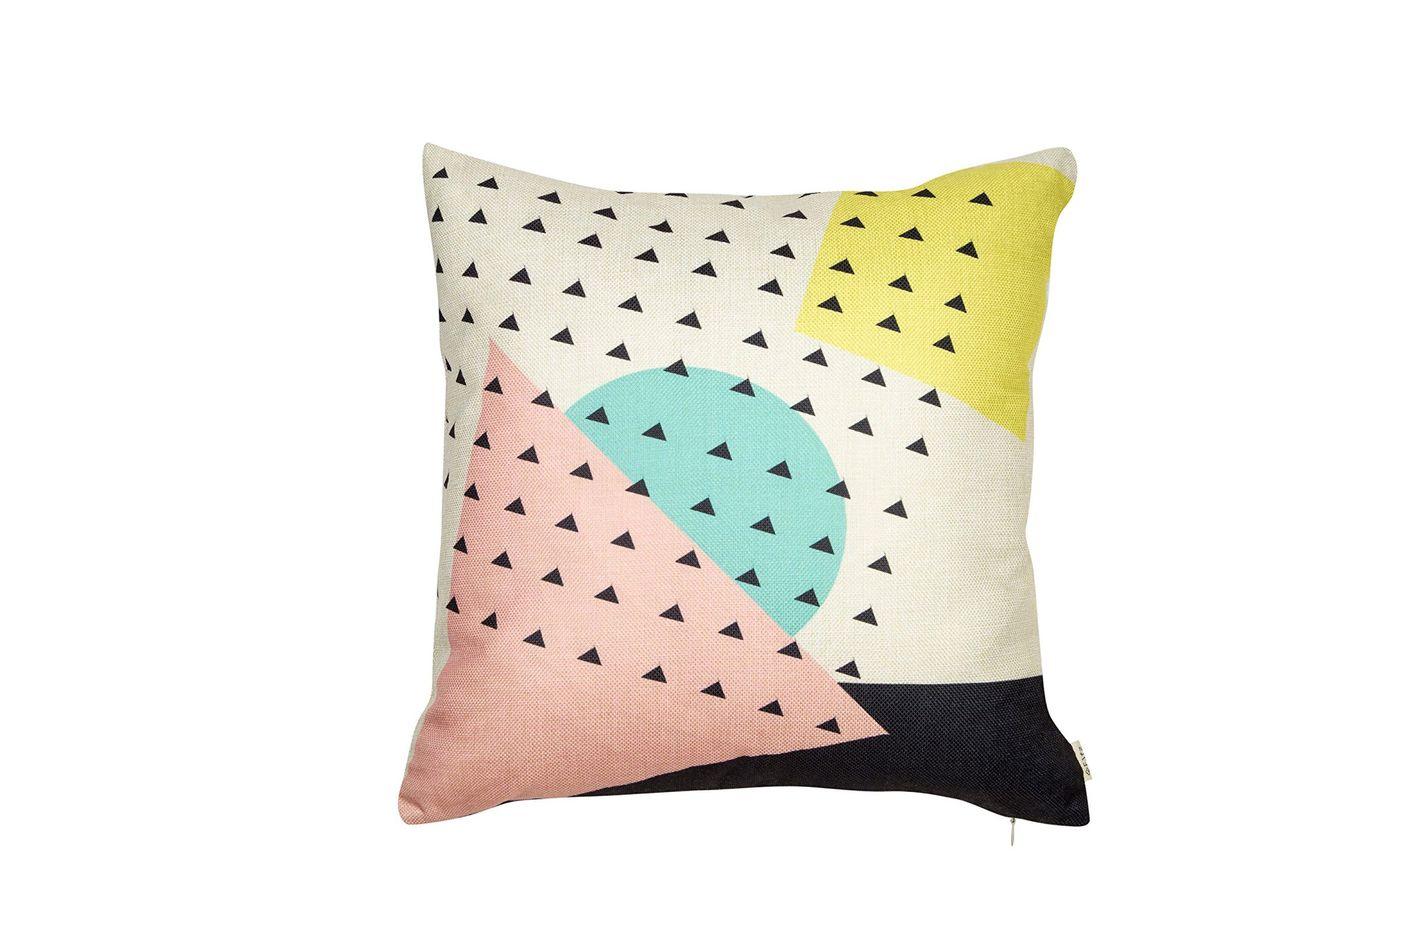 Fjfz Cotton Linen Home Decorative Throw Pillow Case Cushion Cover